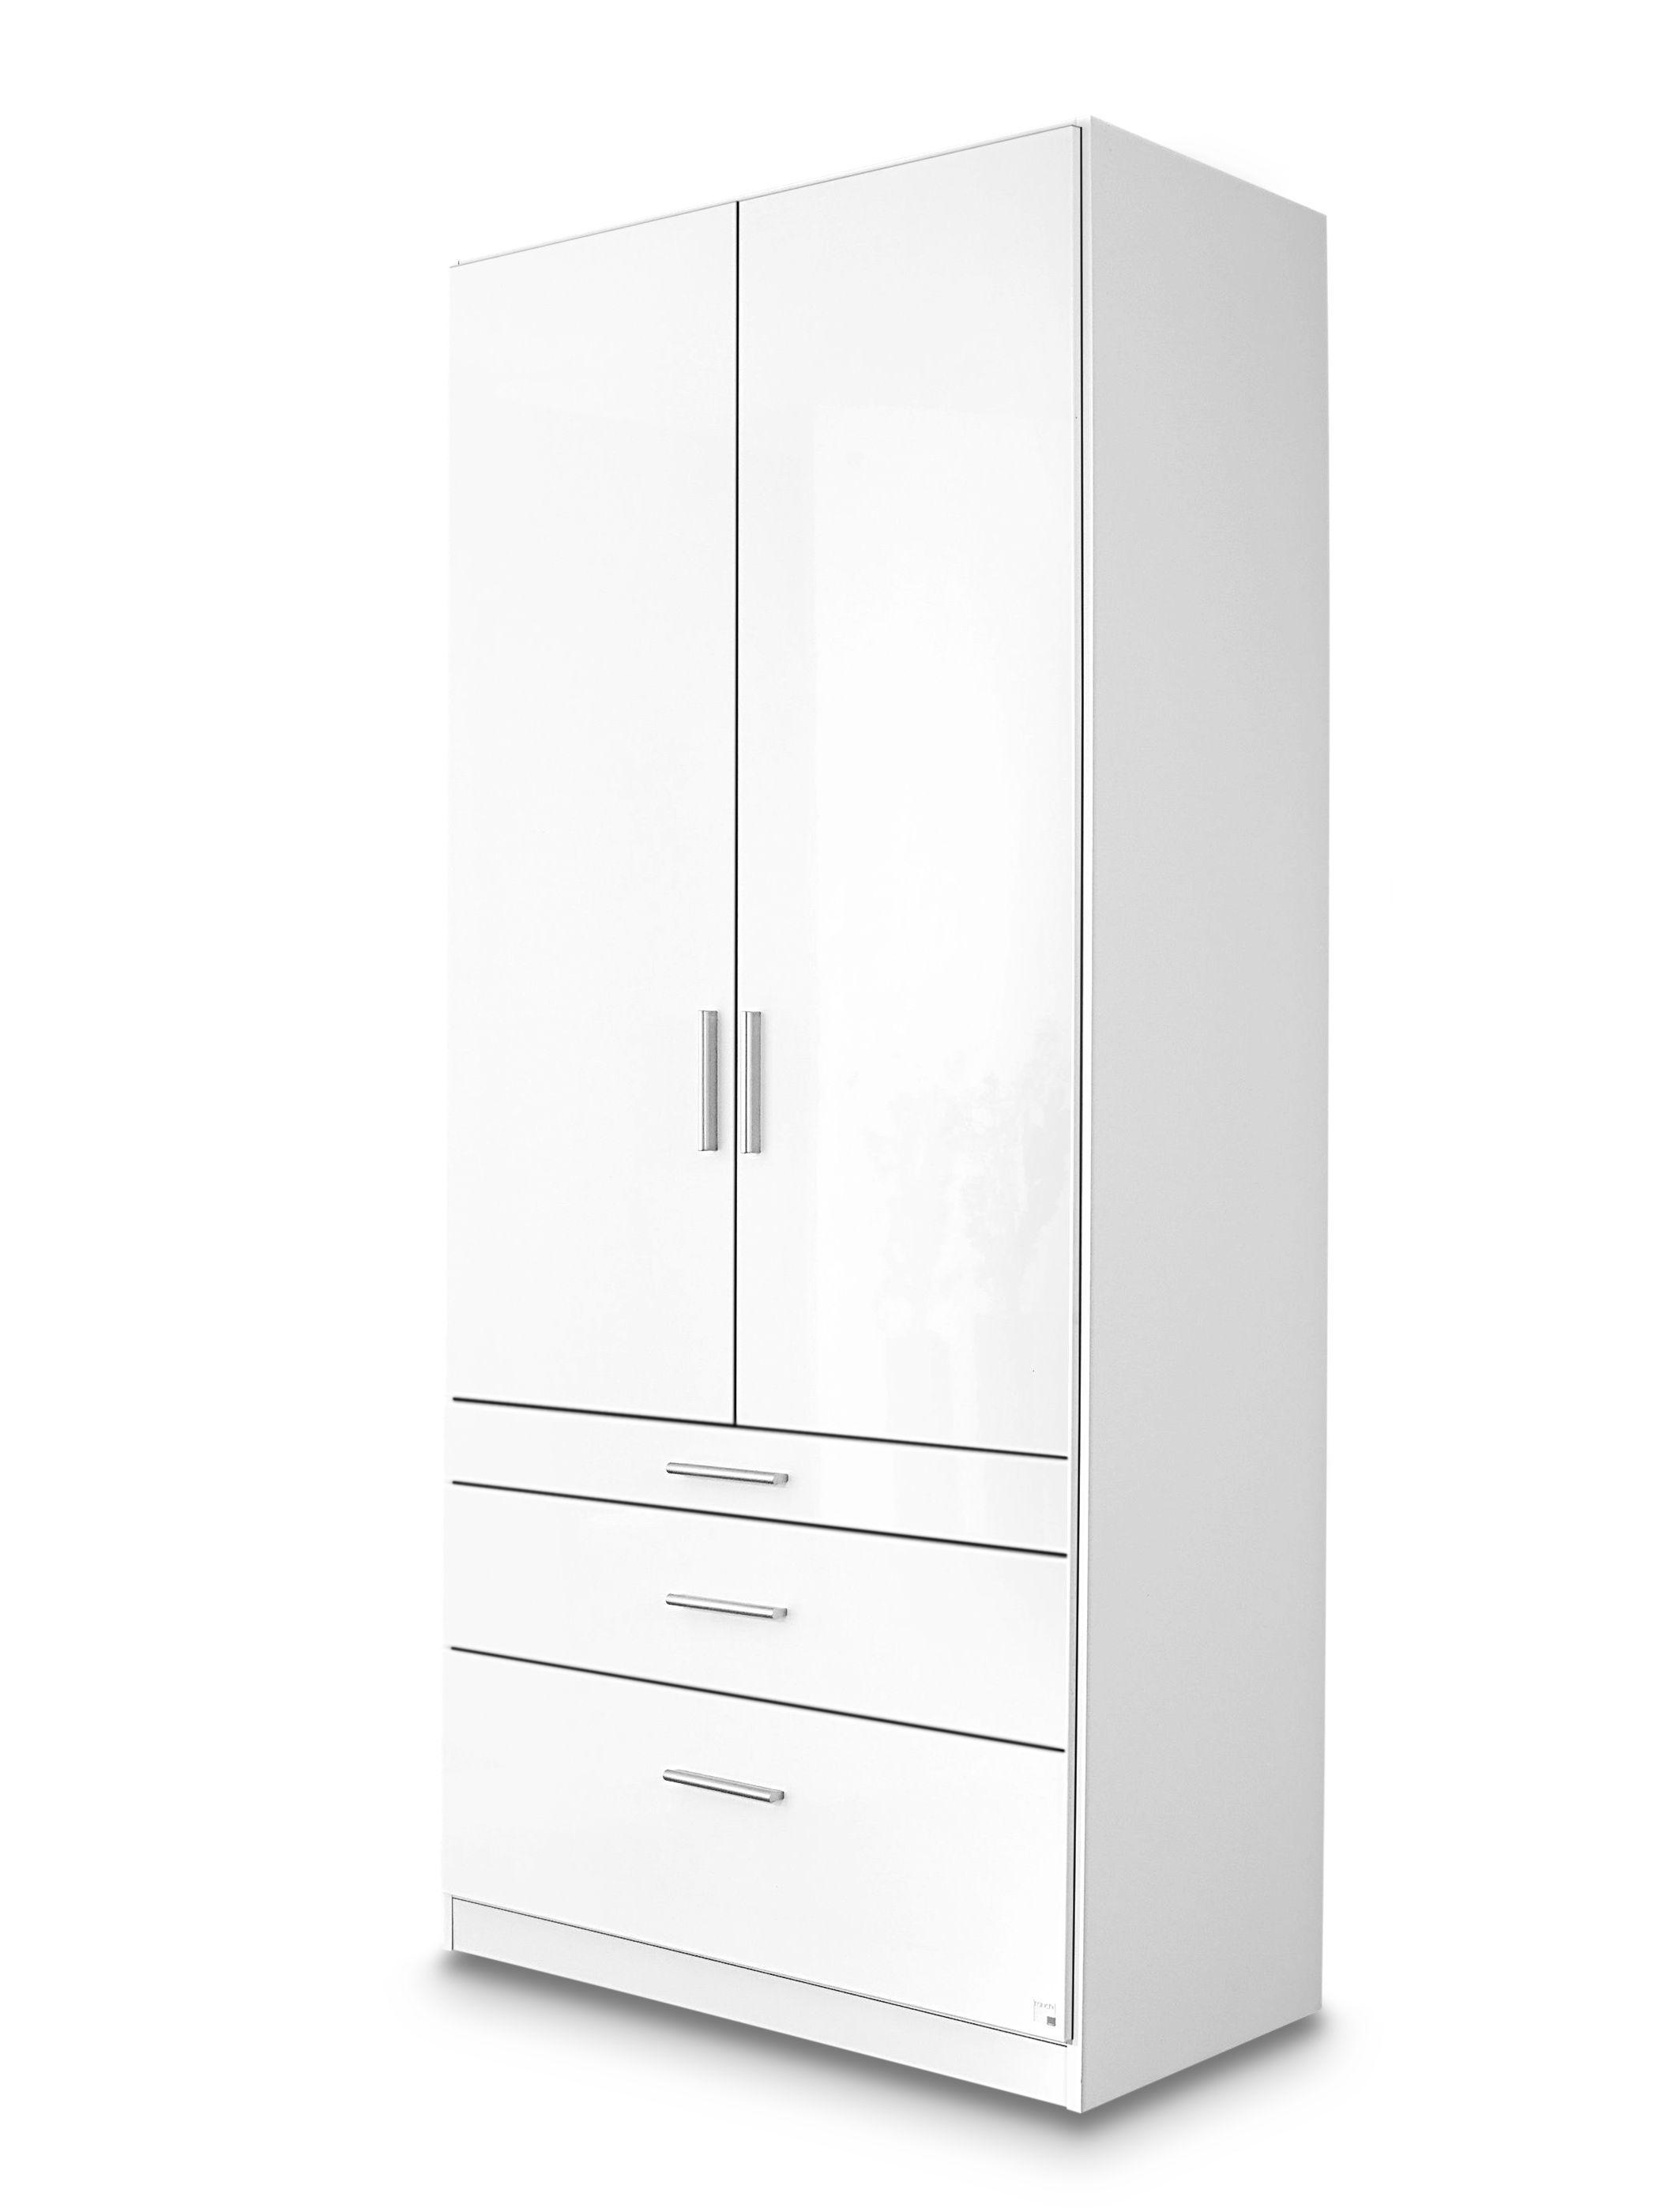 Rauch Möbel Kleiderschrank GENUABHT 91x197x54 cm BHT 91x197x54 cm weiß   eBay